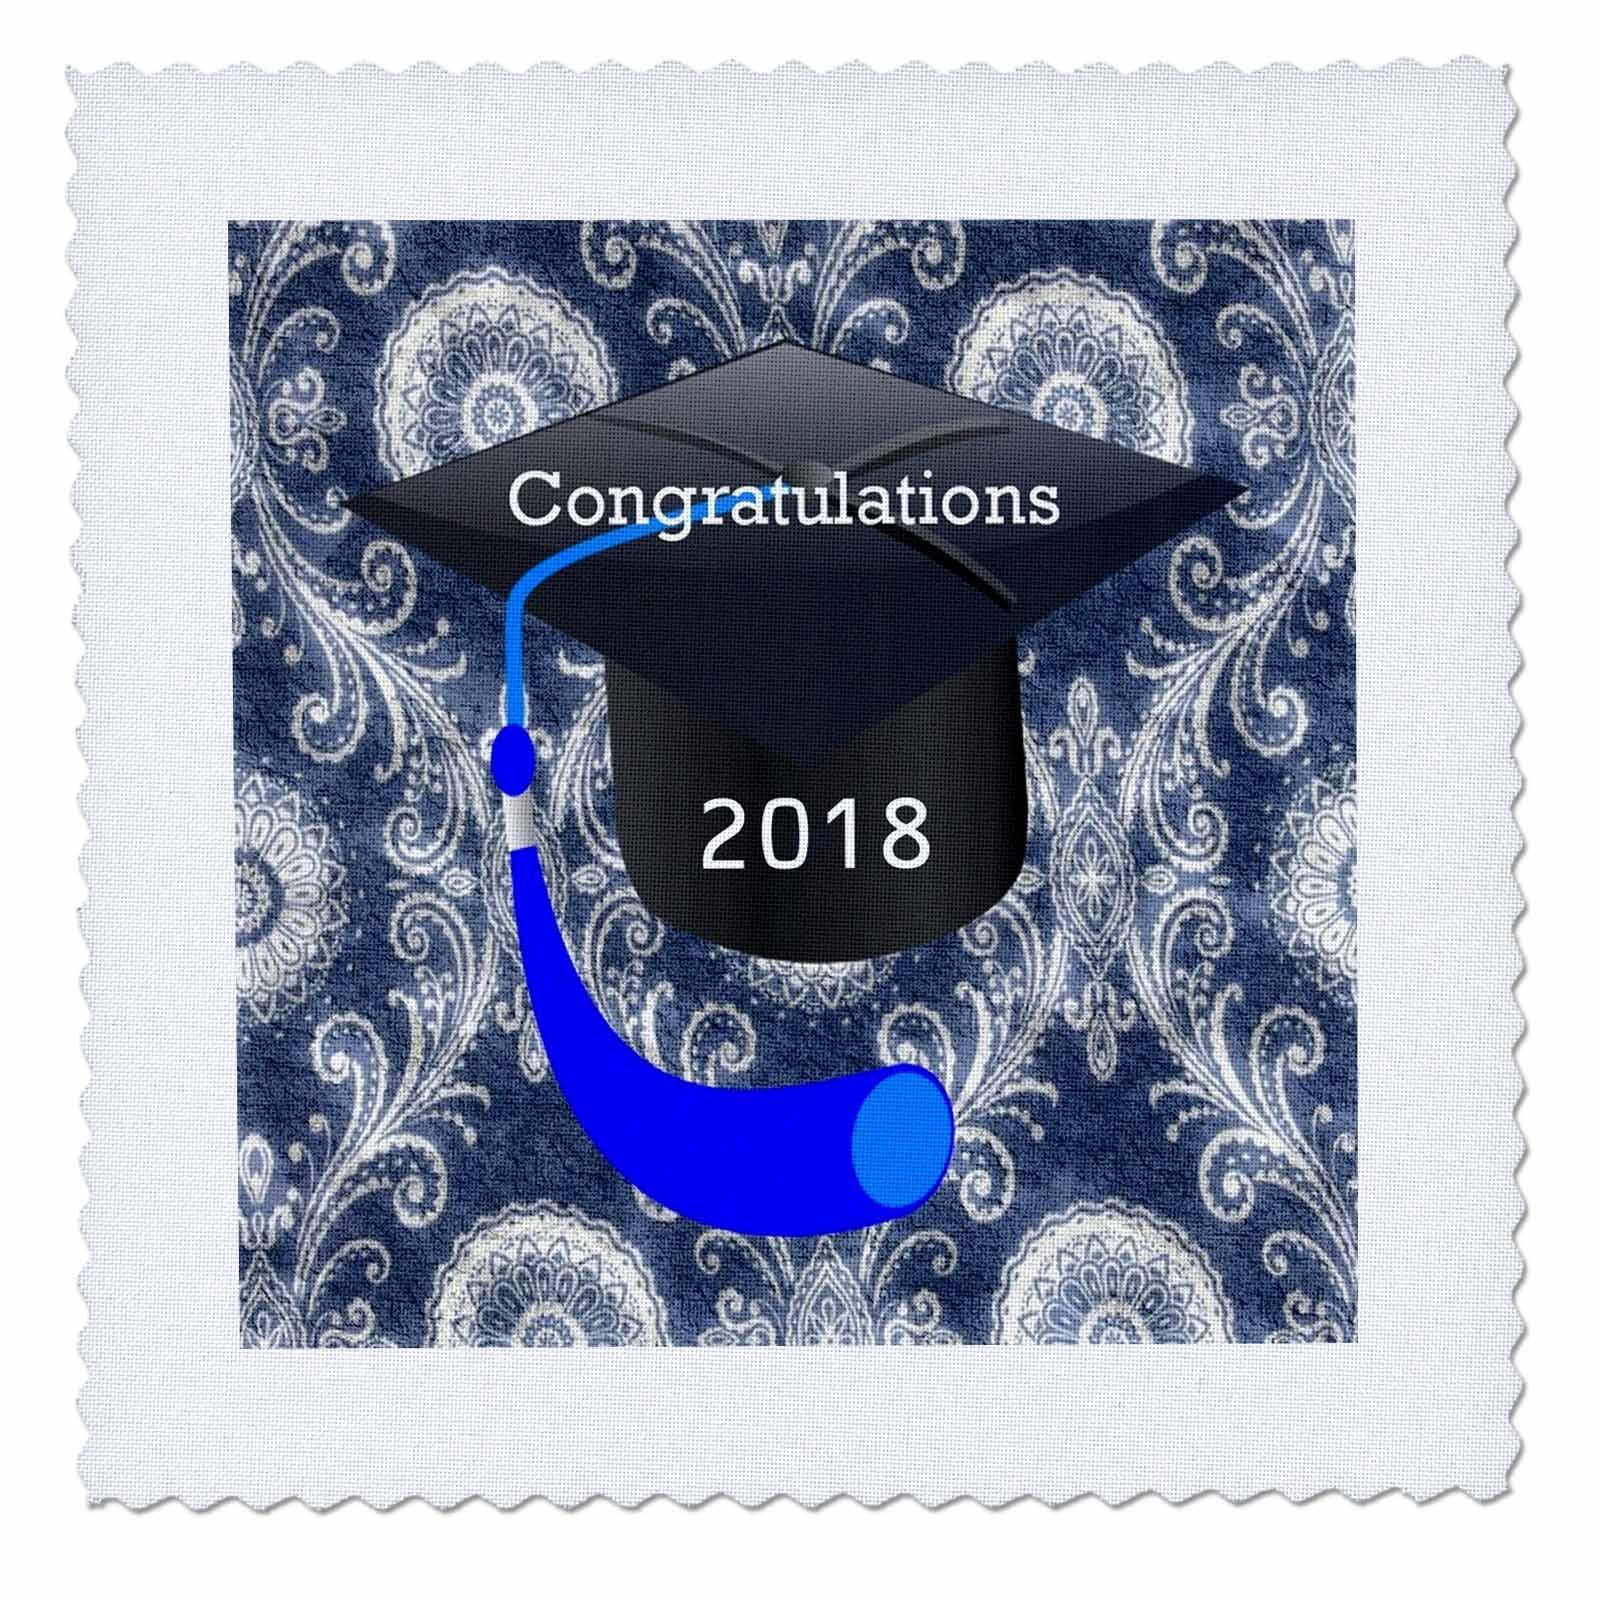 3dRose Graduation - Image of Congratulations Black Cap Blue Tassel Blue Damask - 16x16 inch quilt square (qs_266444_6)